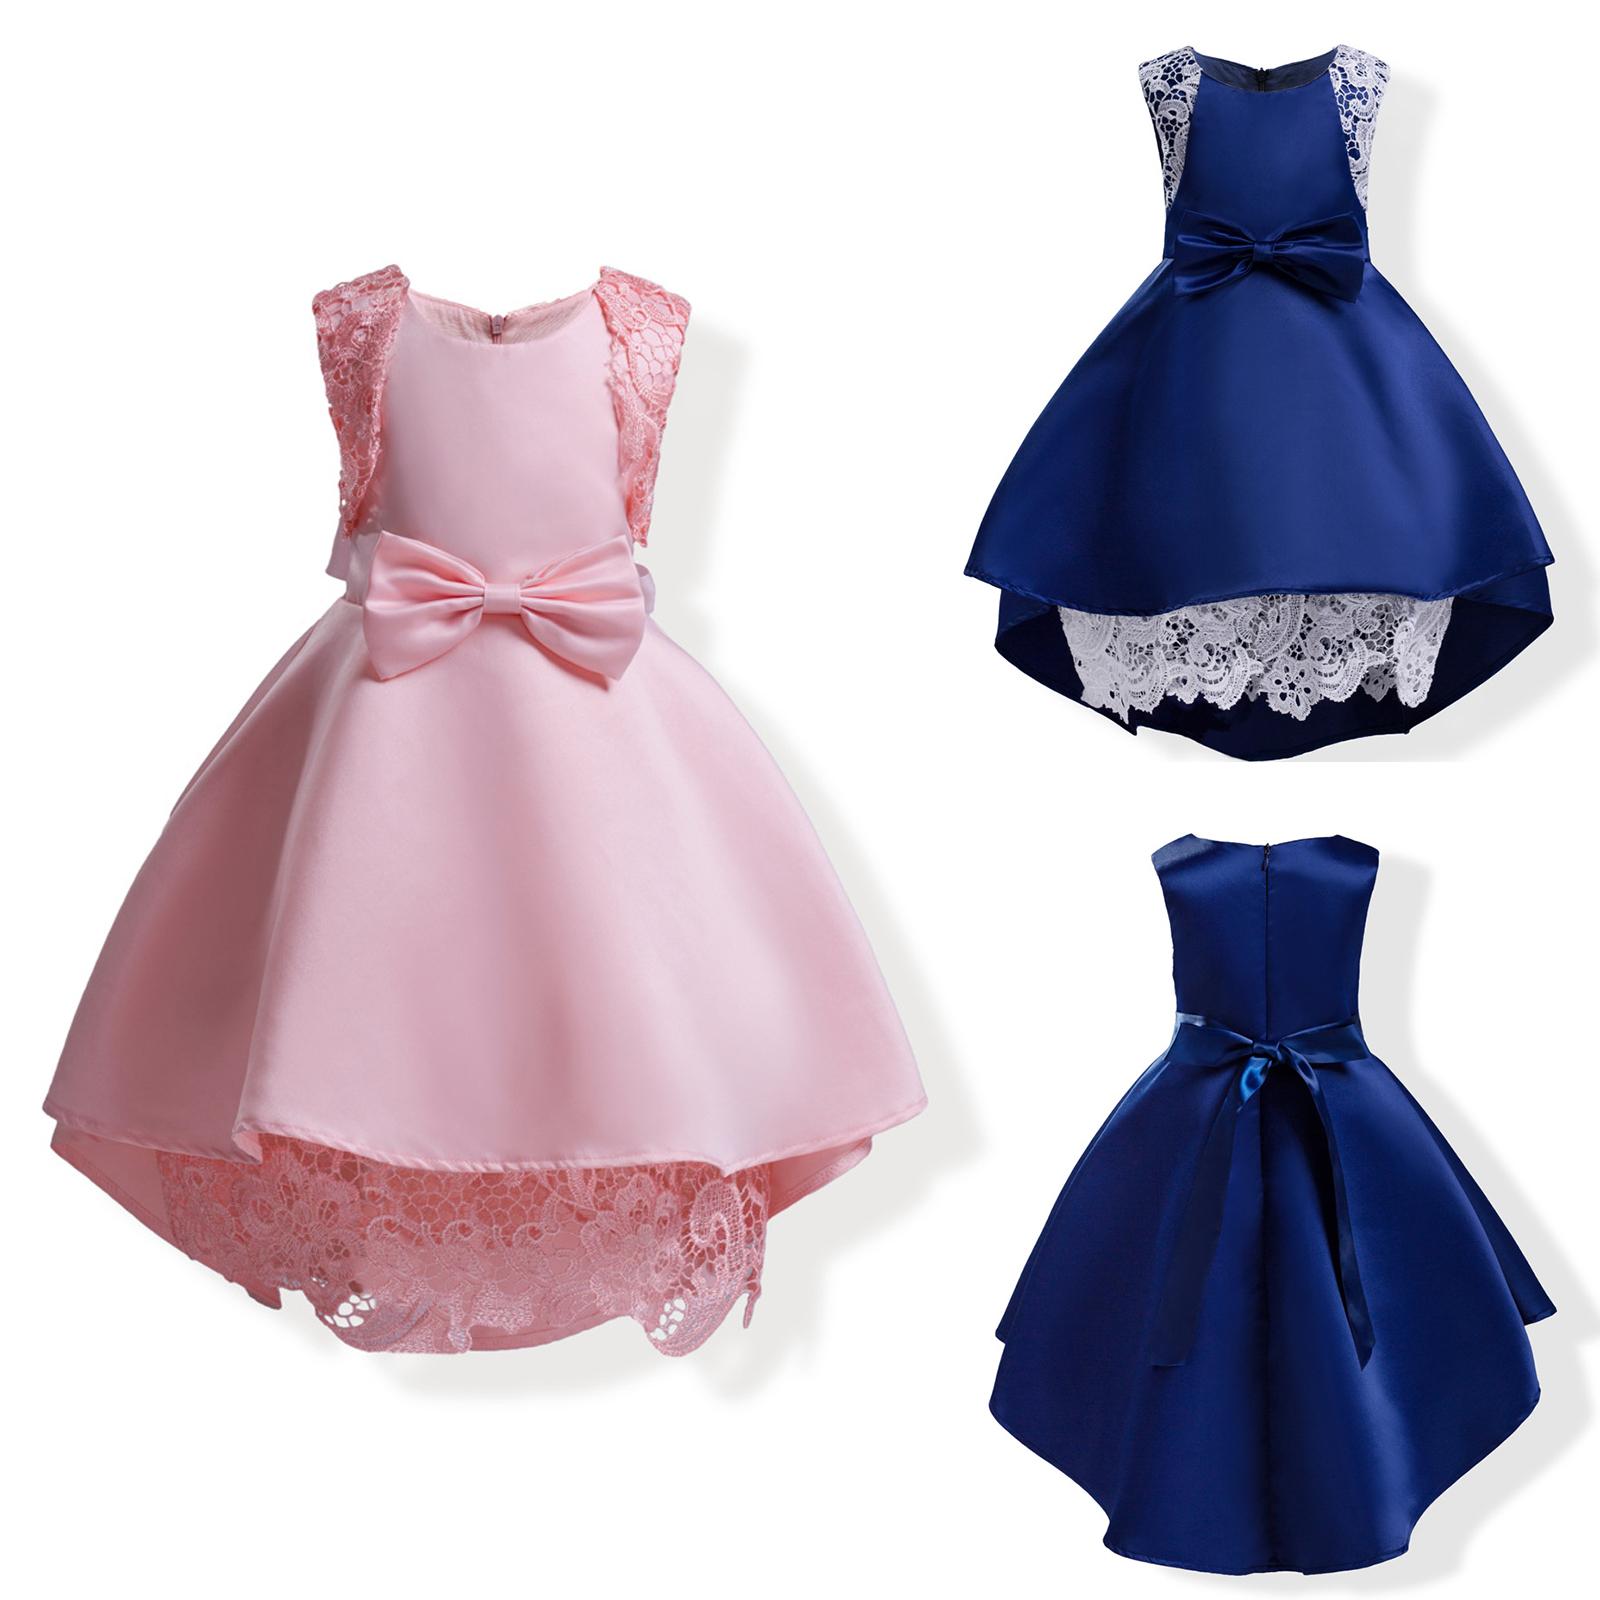 Flower Girls Kids Baby Sleeveless Princess Dress Wedding Party Pageant Dresses